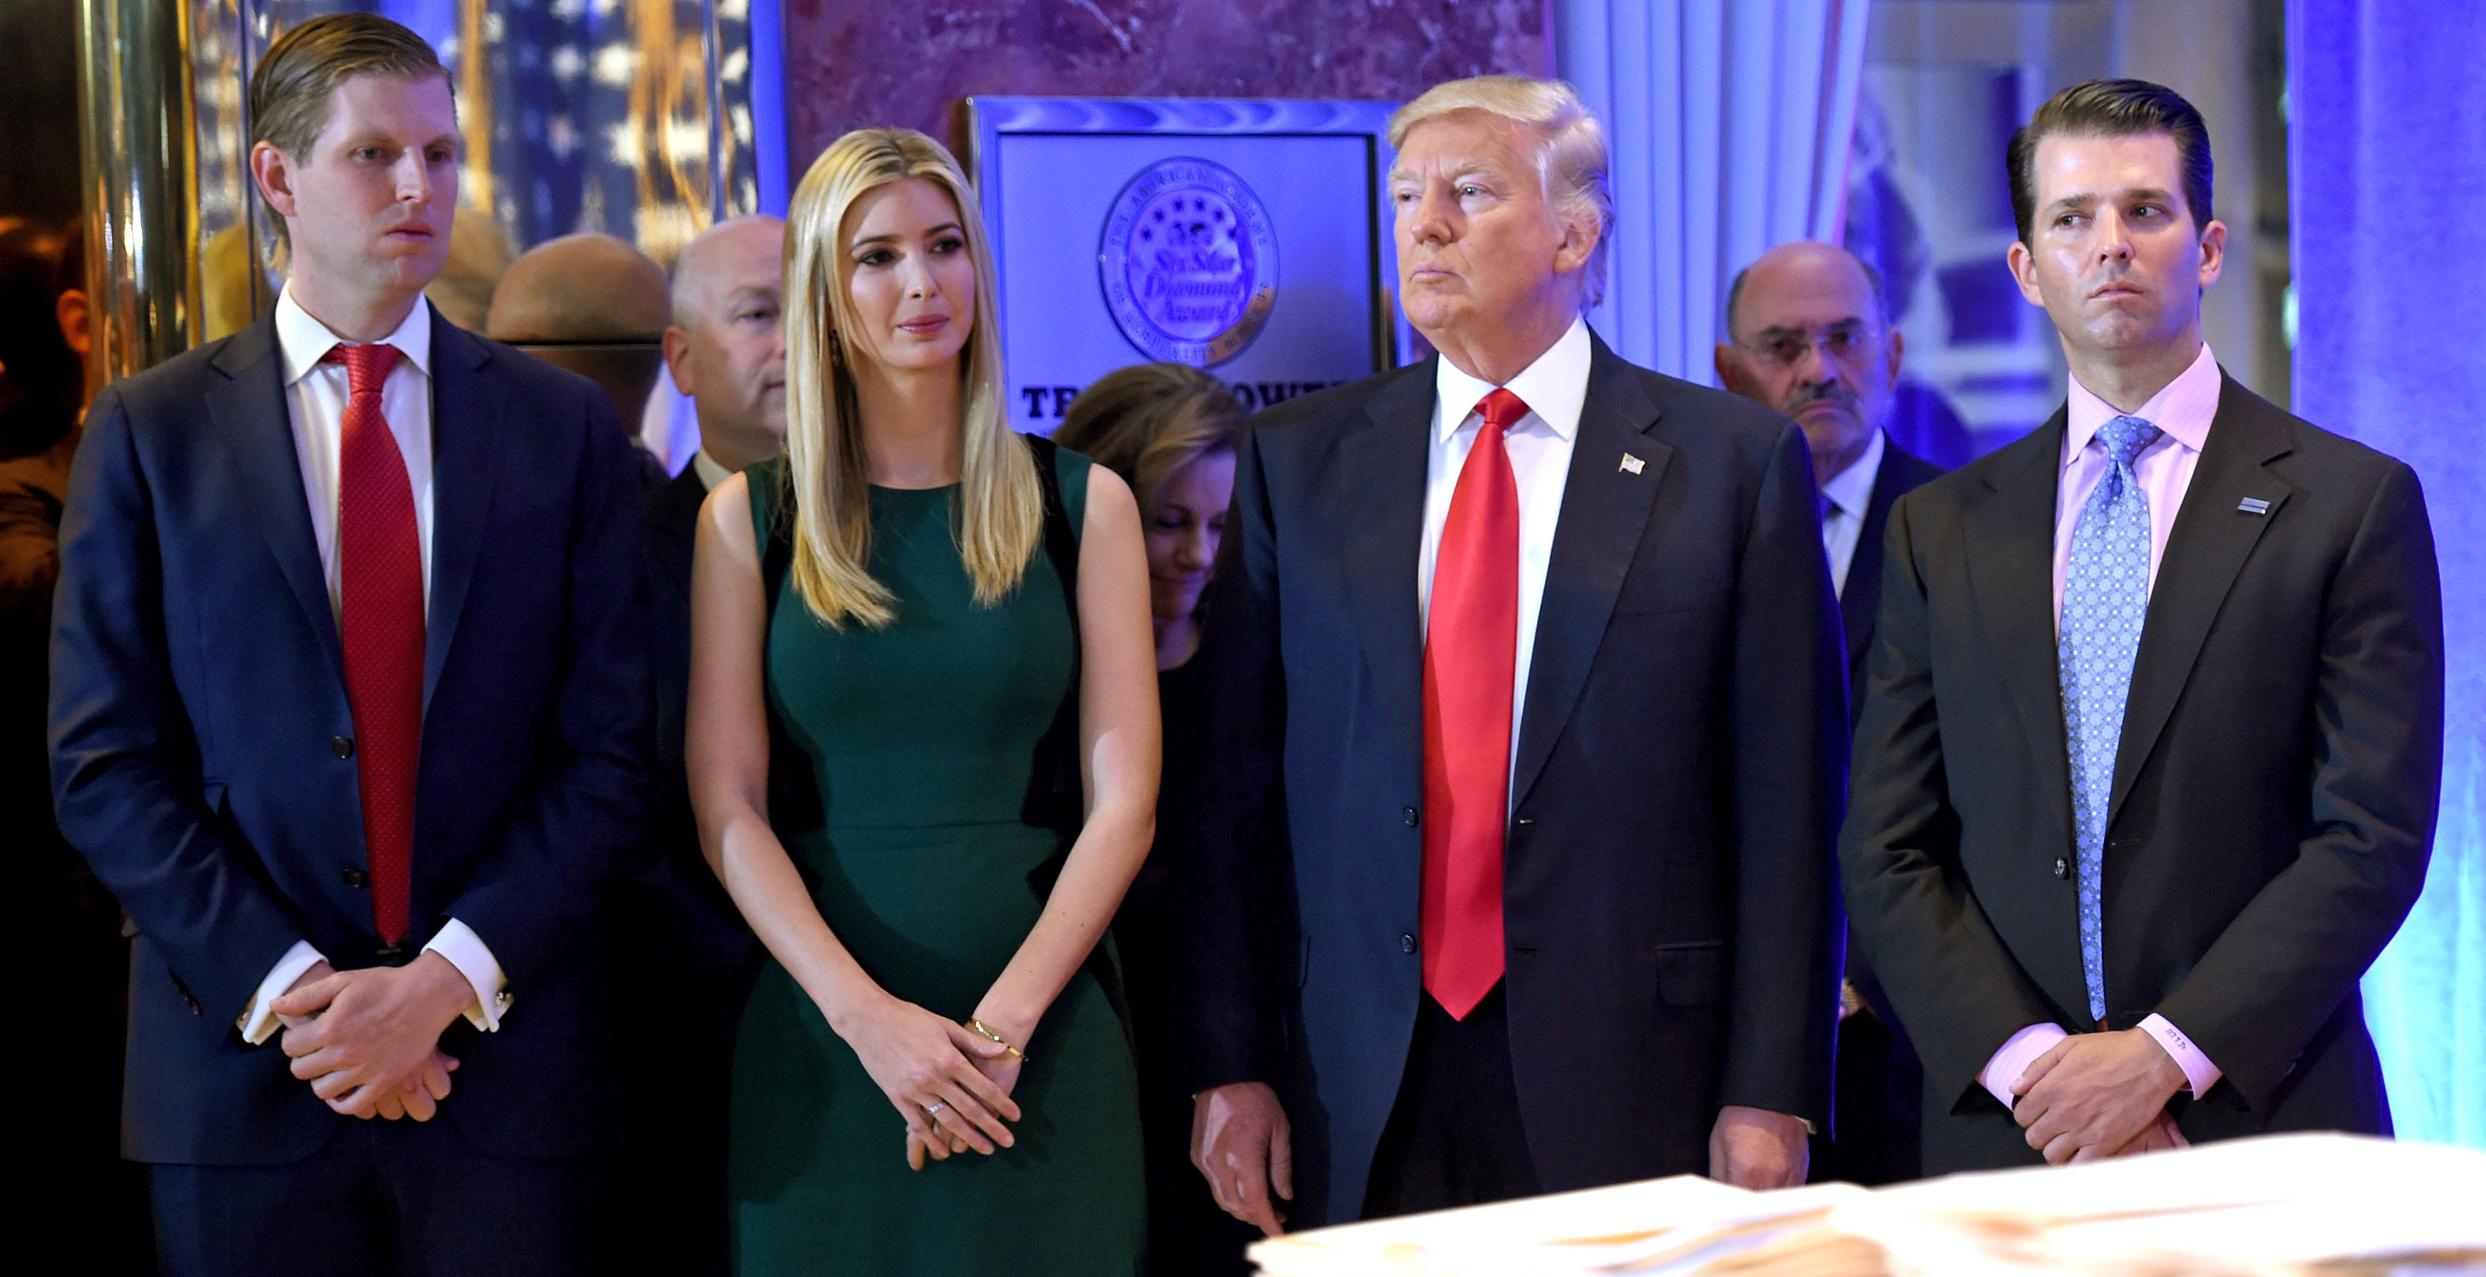 New-York-sues-Trump-Foundation,-alleging-illegal-activity